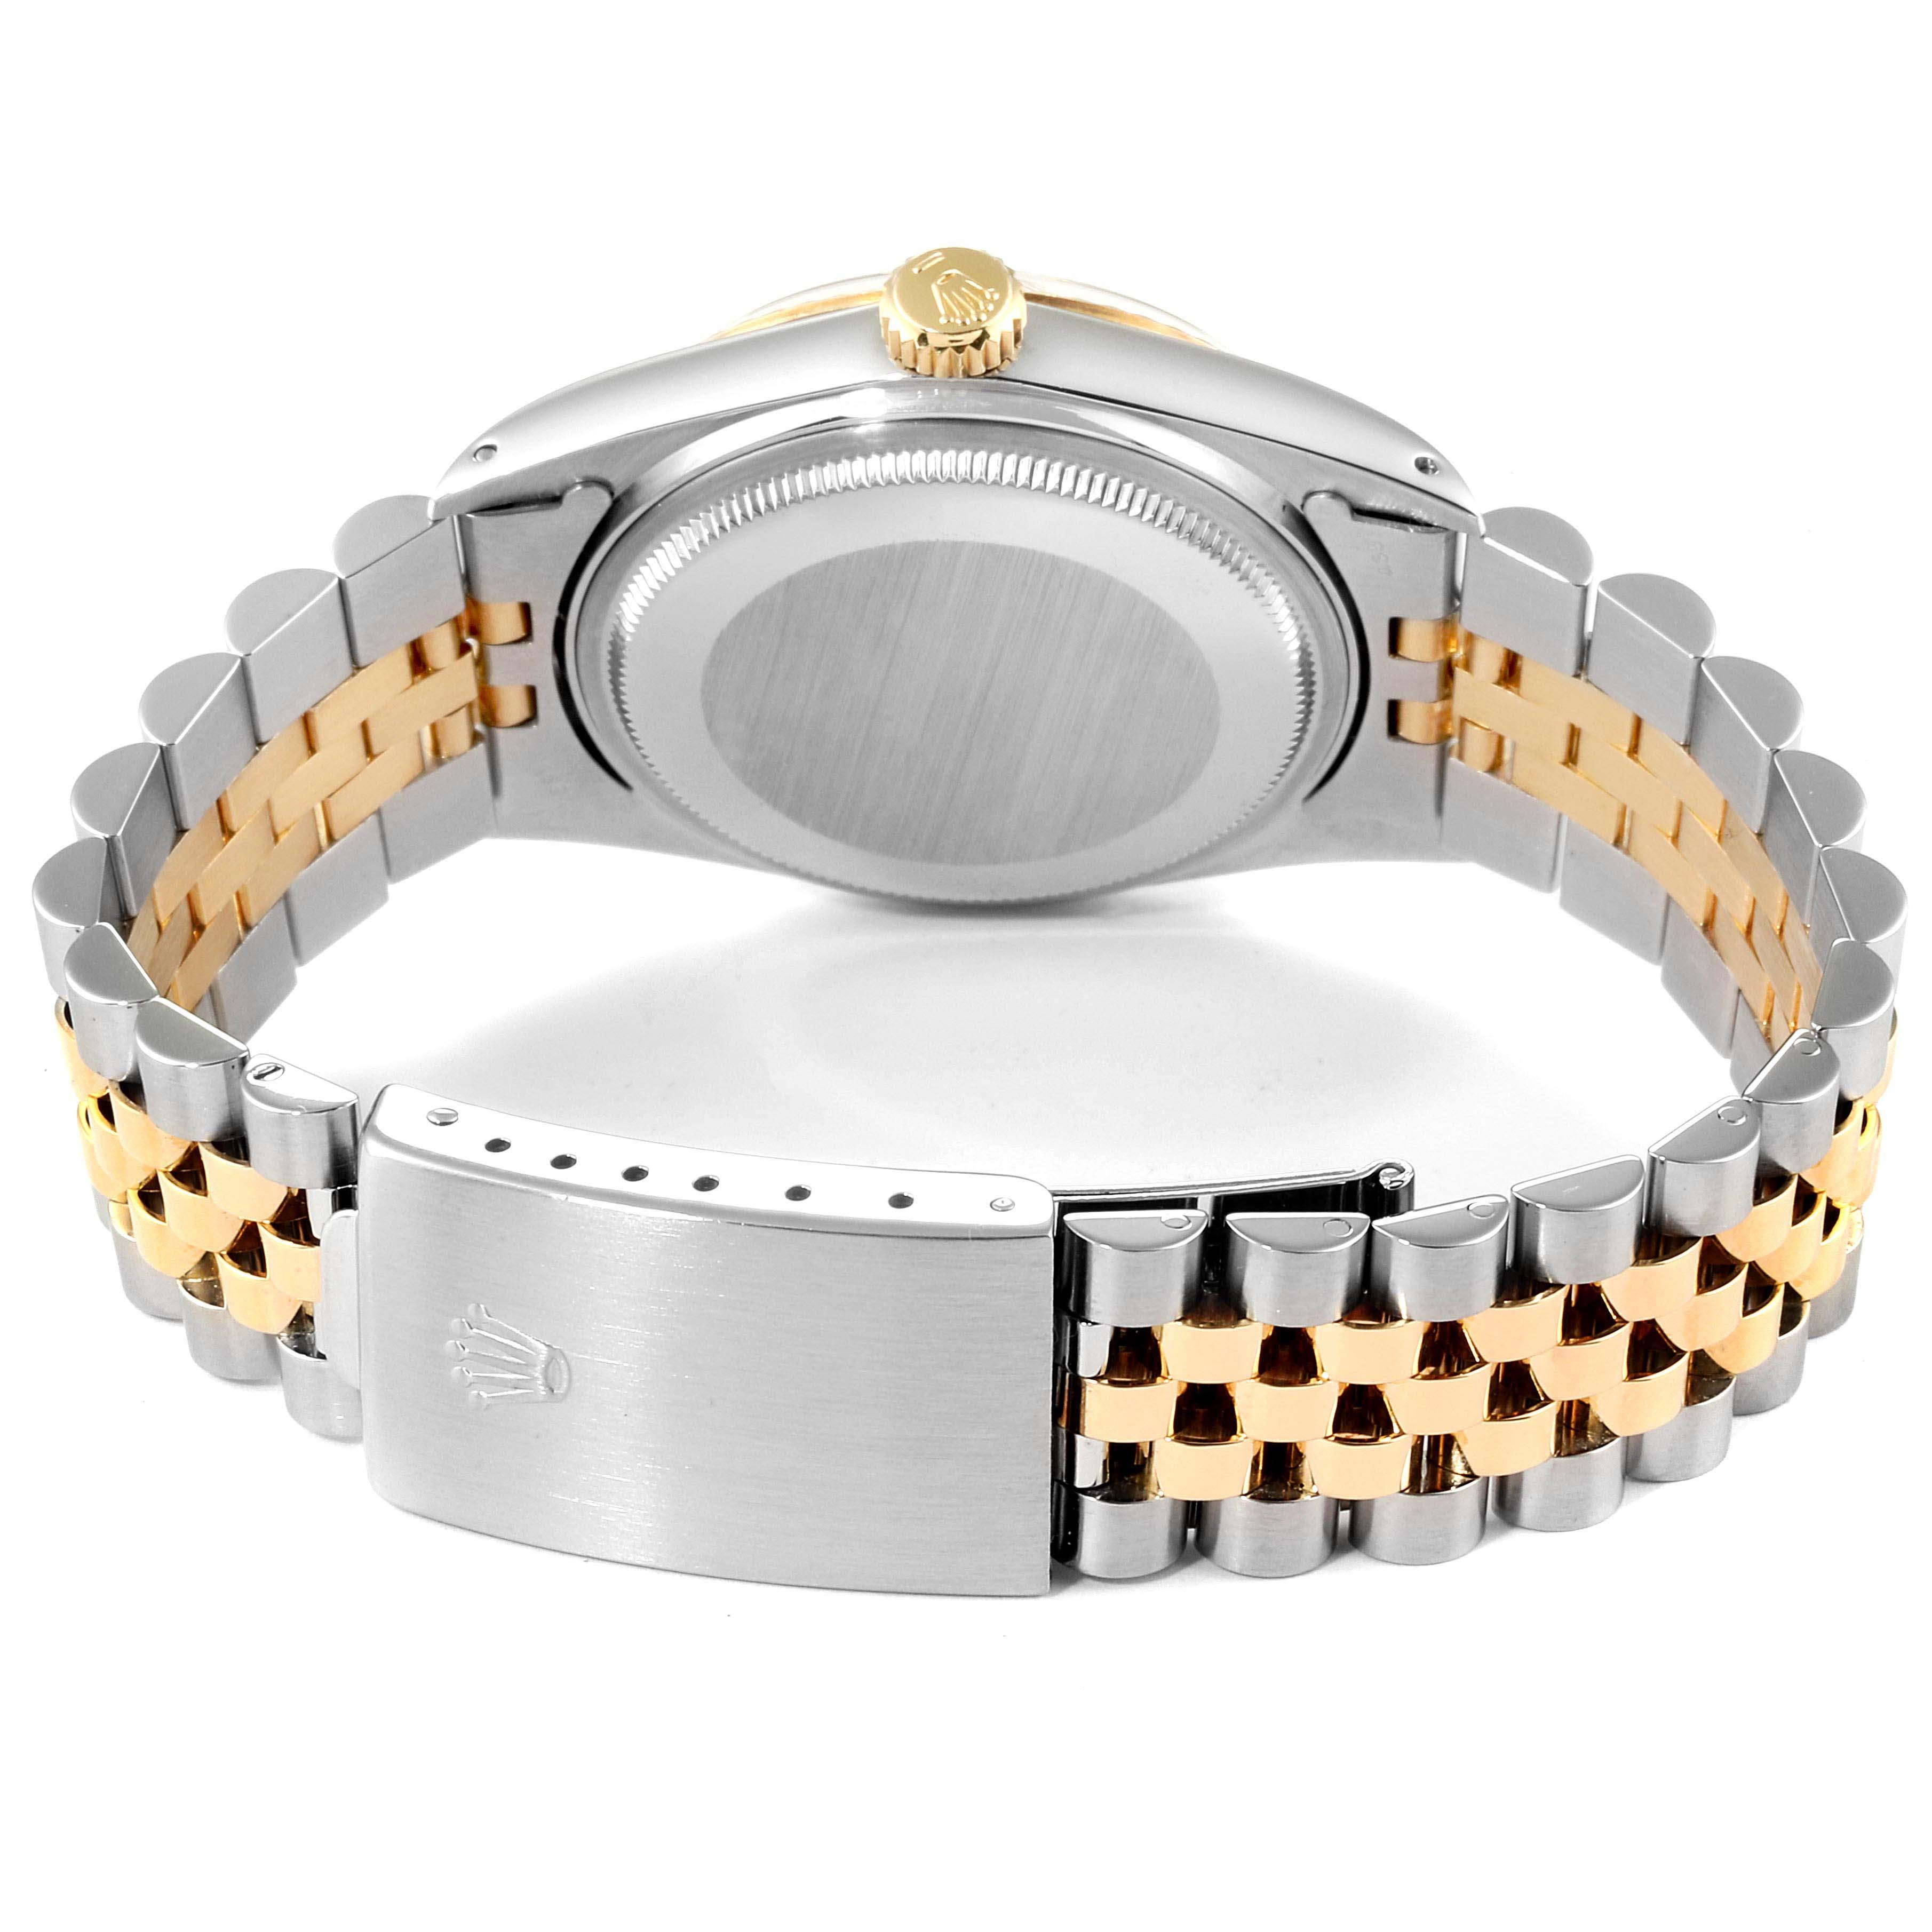 Rolex Datejust Steel Yellow Gold Buckley Dial Mens Watch 16013 Box SwissWatchExpo